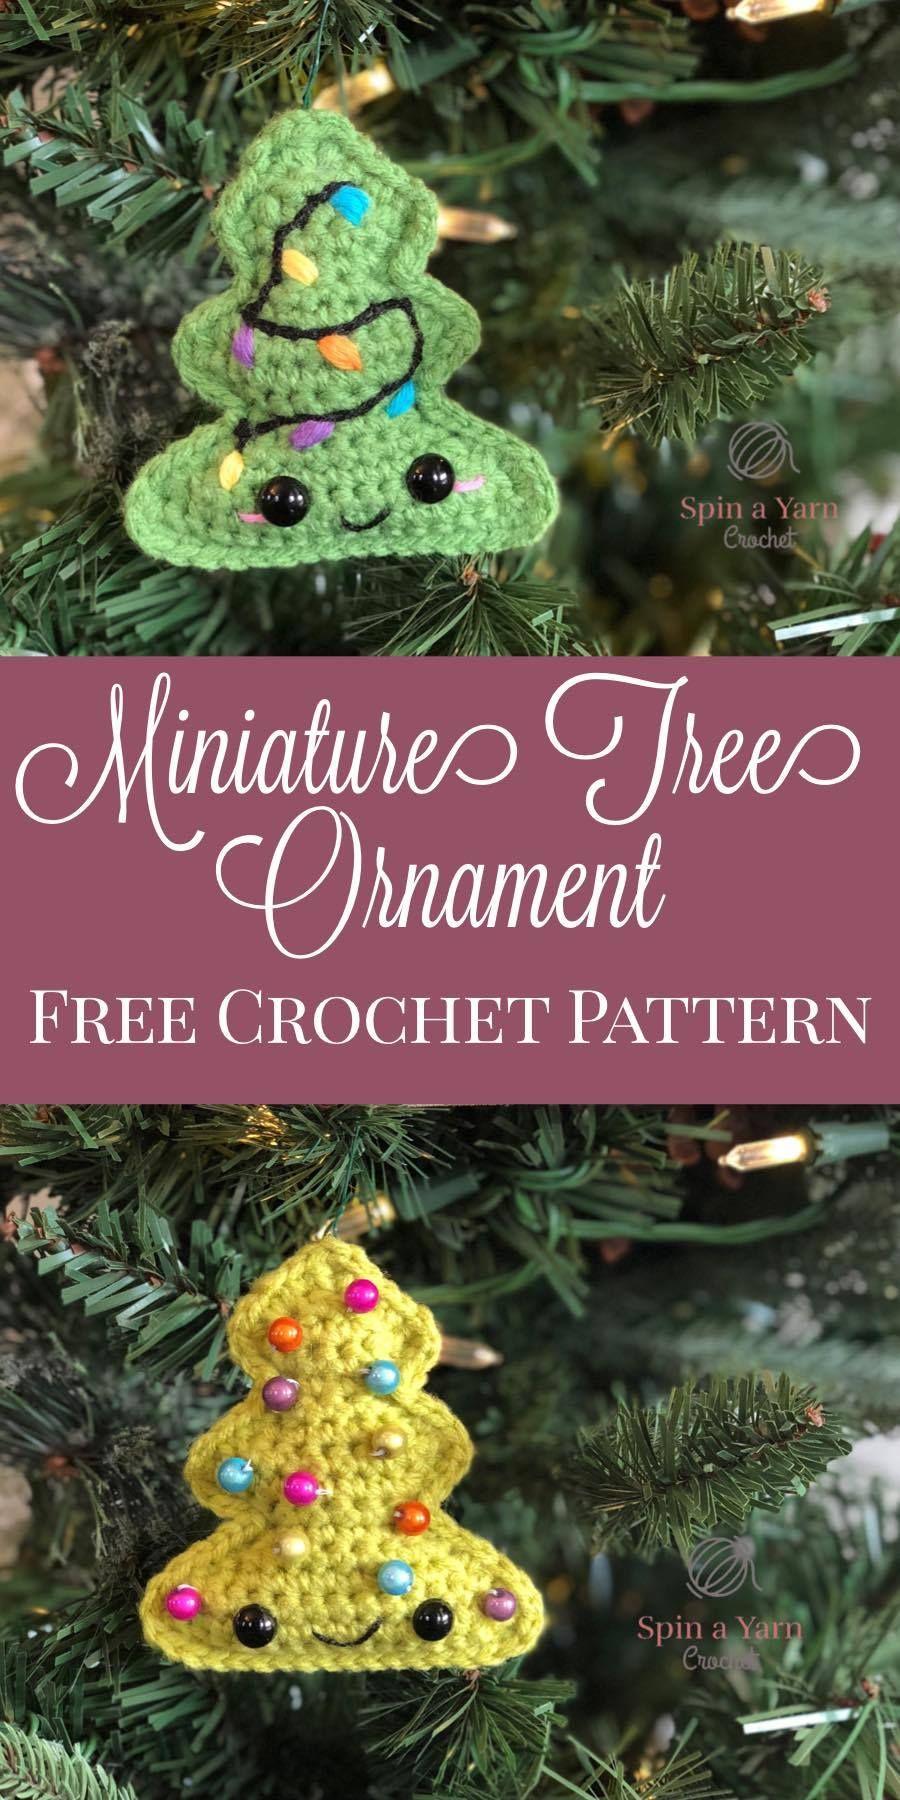 Miniature Tree Ornament - Spin a Yarn Crochet | crocheting ...